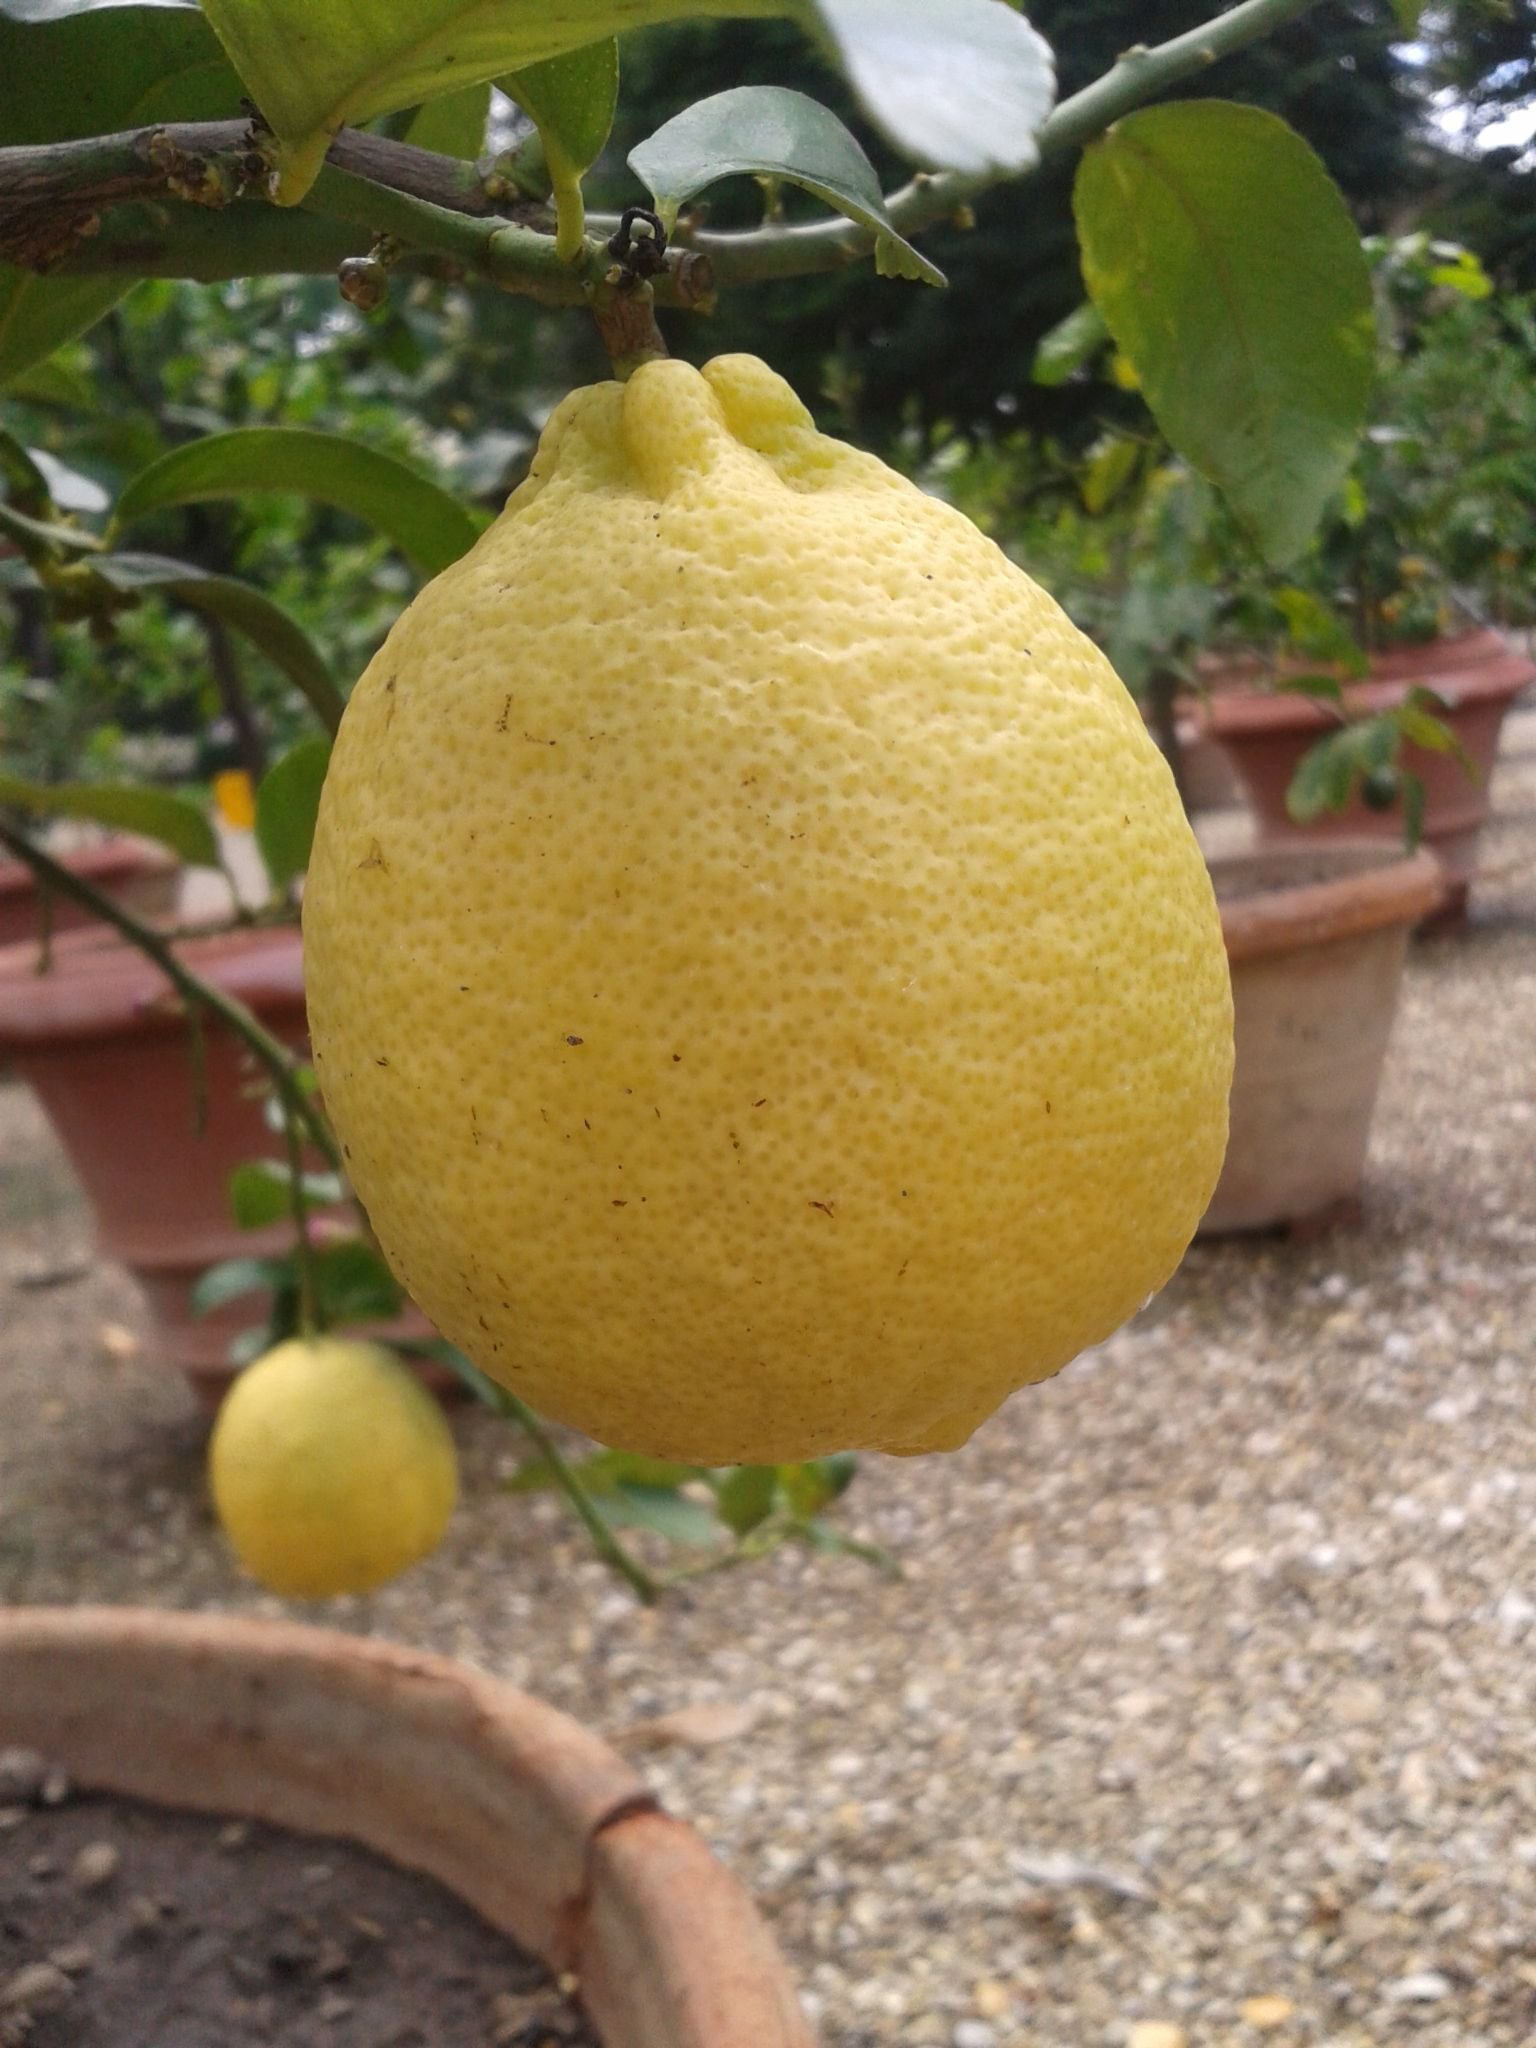 Another lemon - Lemon garden - Palais Pitti  - Florence by Francine Waterman